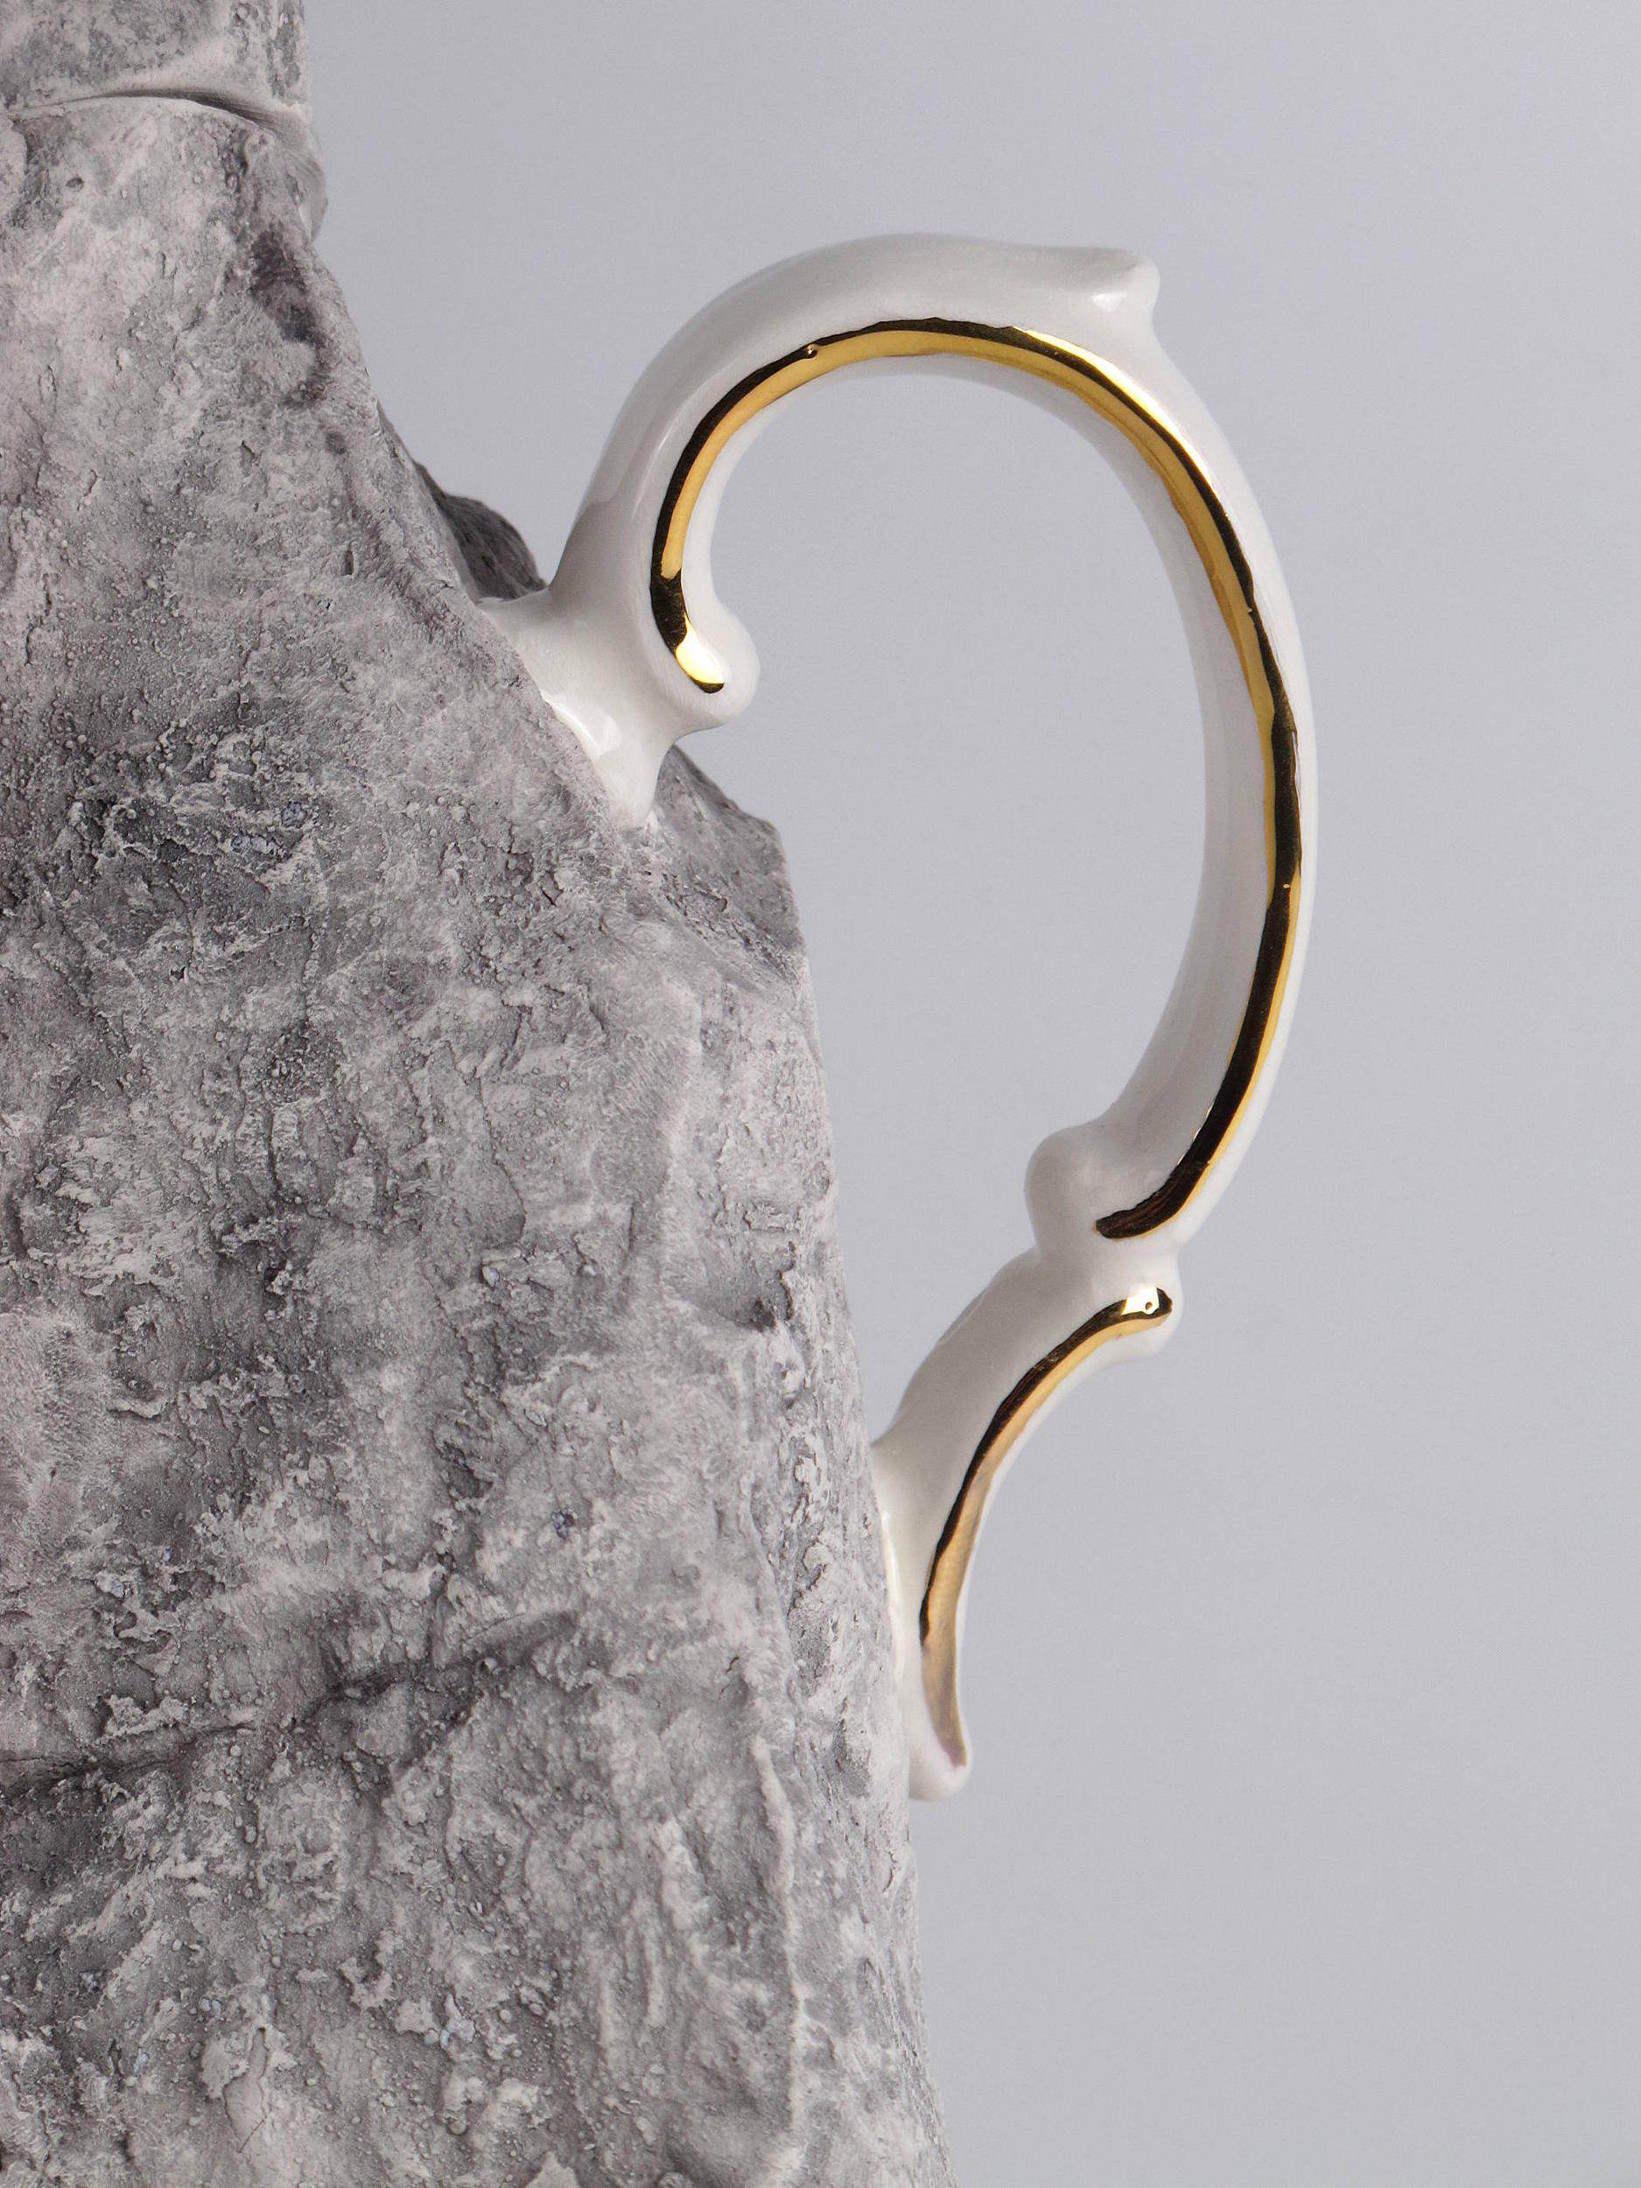 Lapidaria rock jug art project contemporary ceramic by Studio17 Caterina Sbrana Gabriele Mallegni